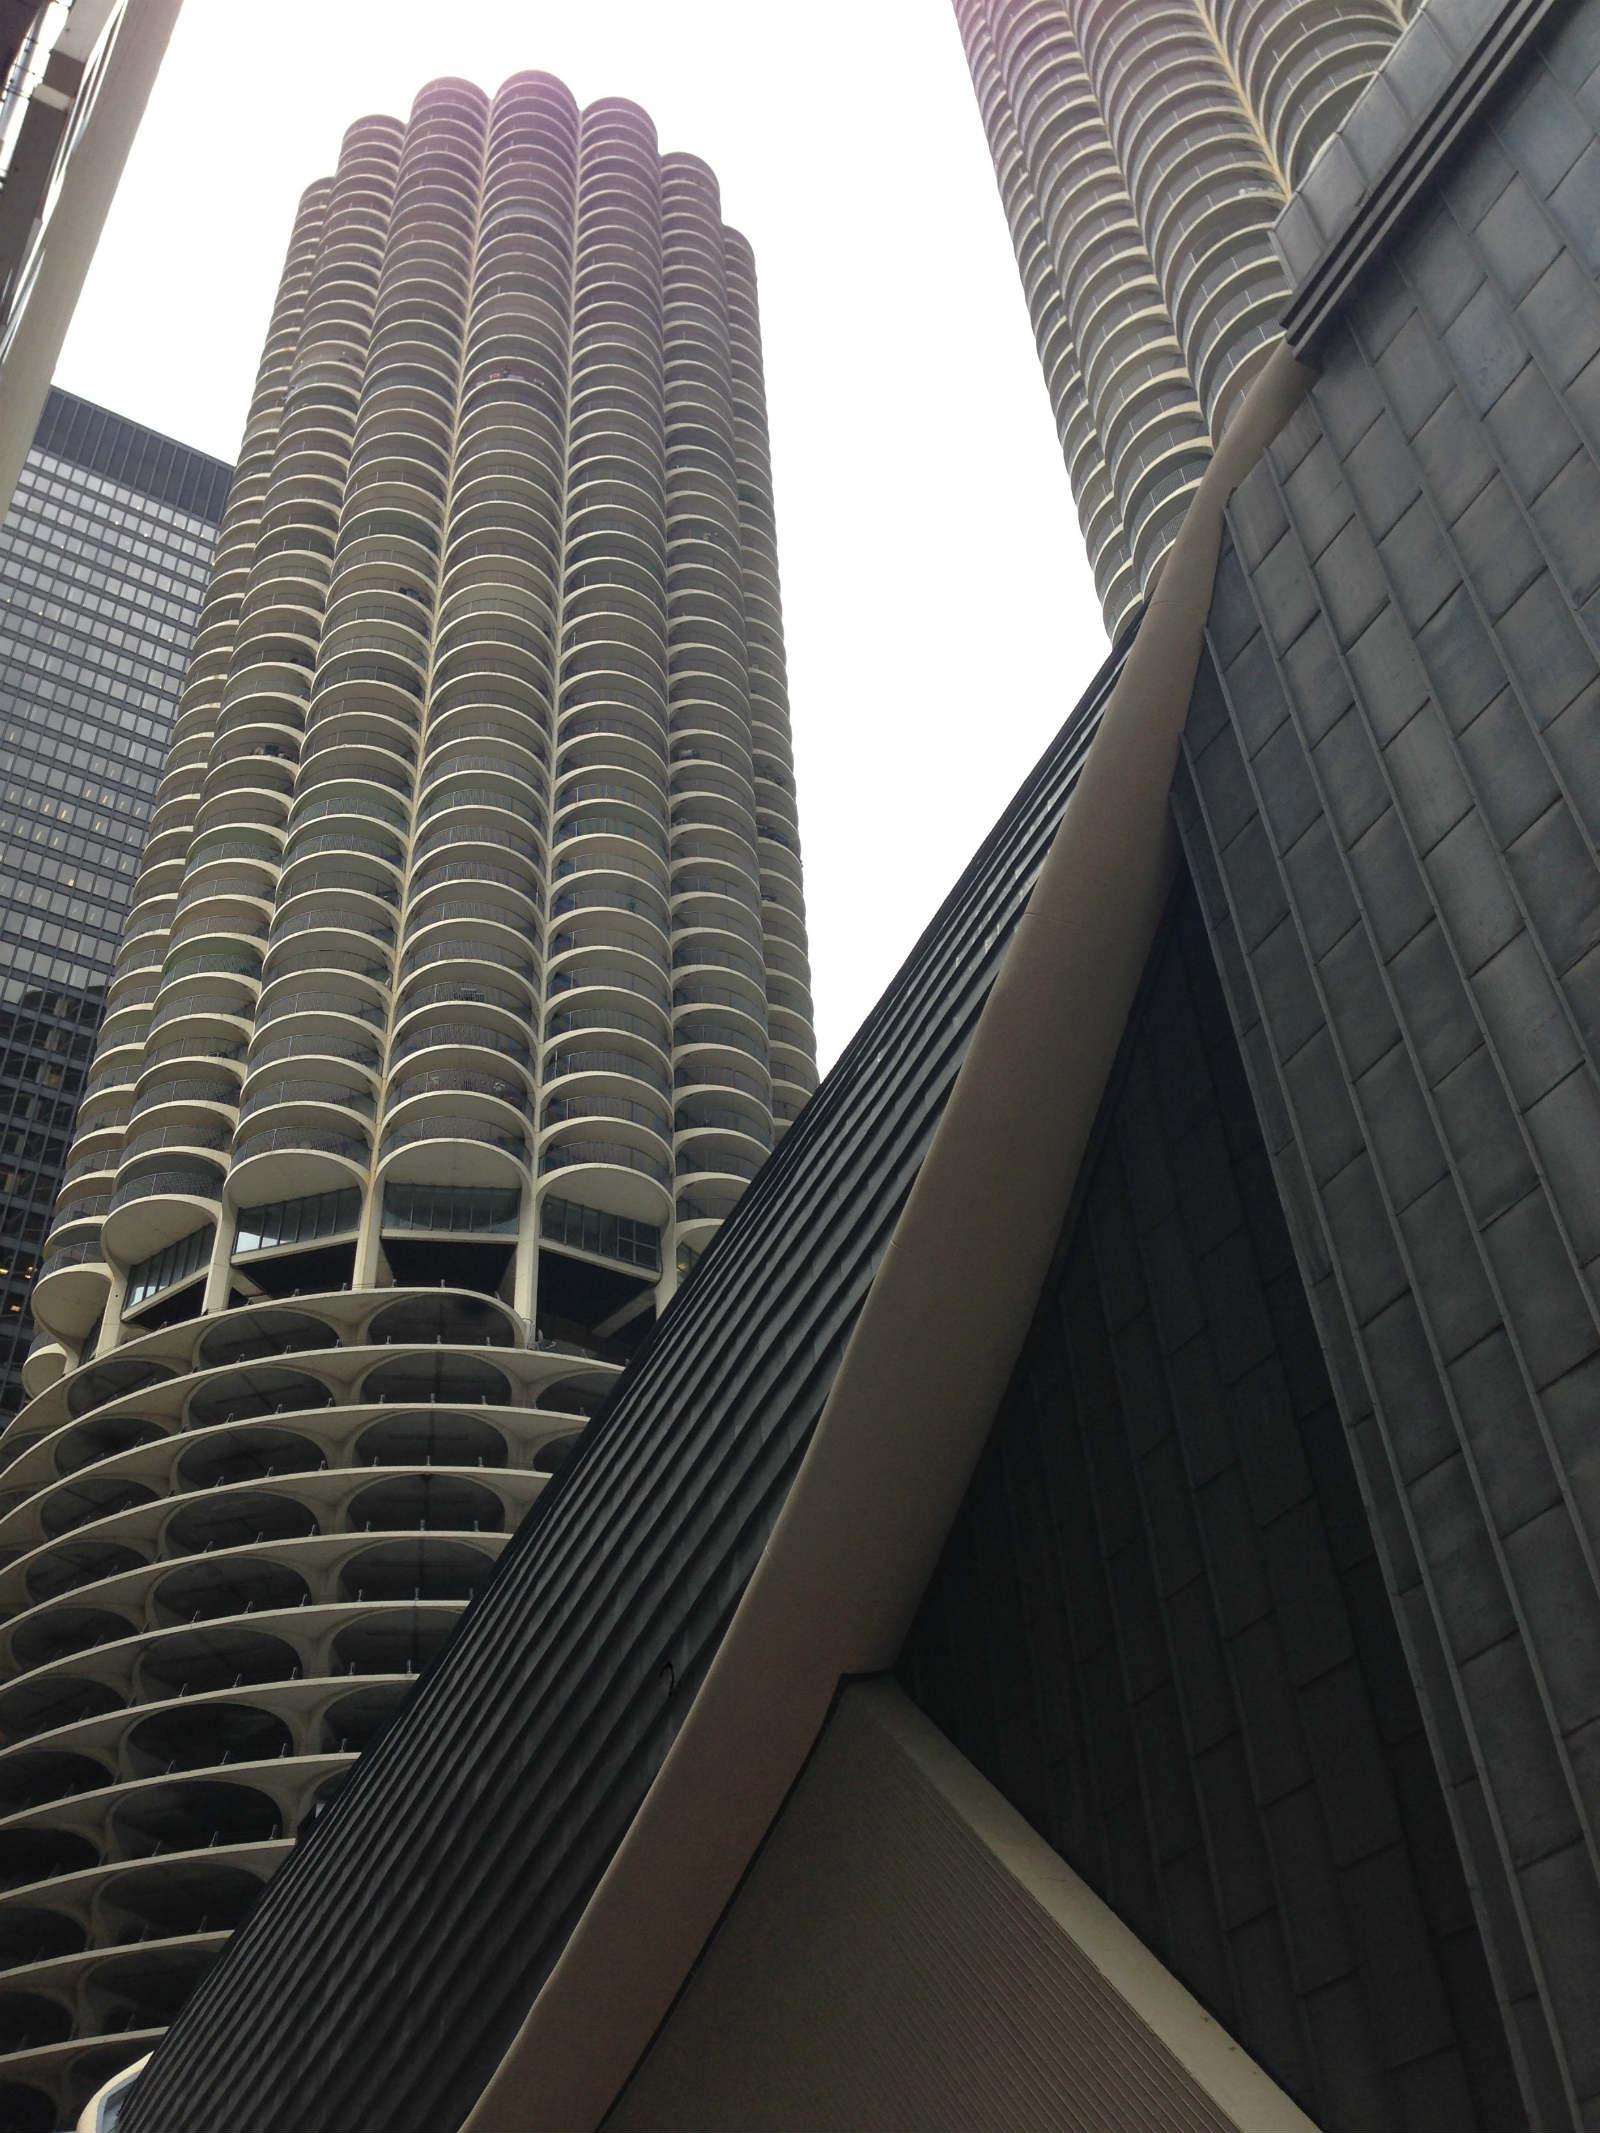 Marina City/House of Blues. Chicago, IL.